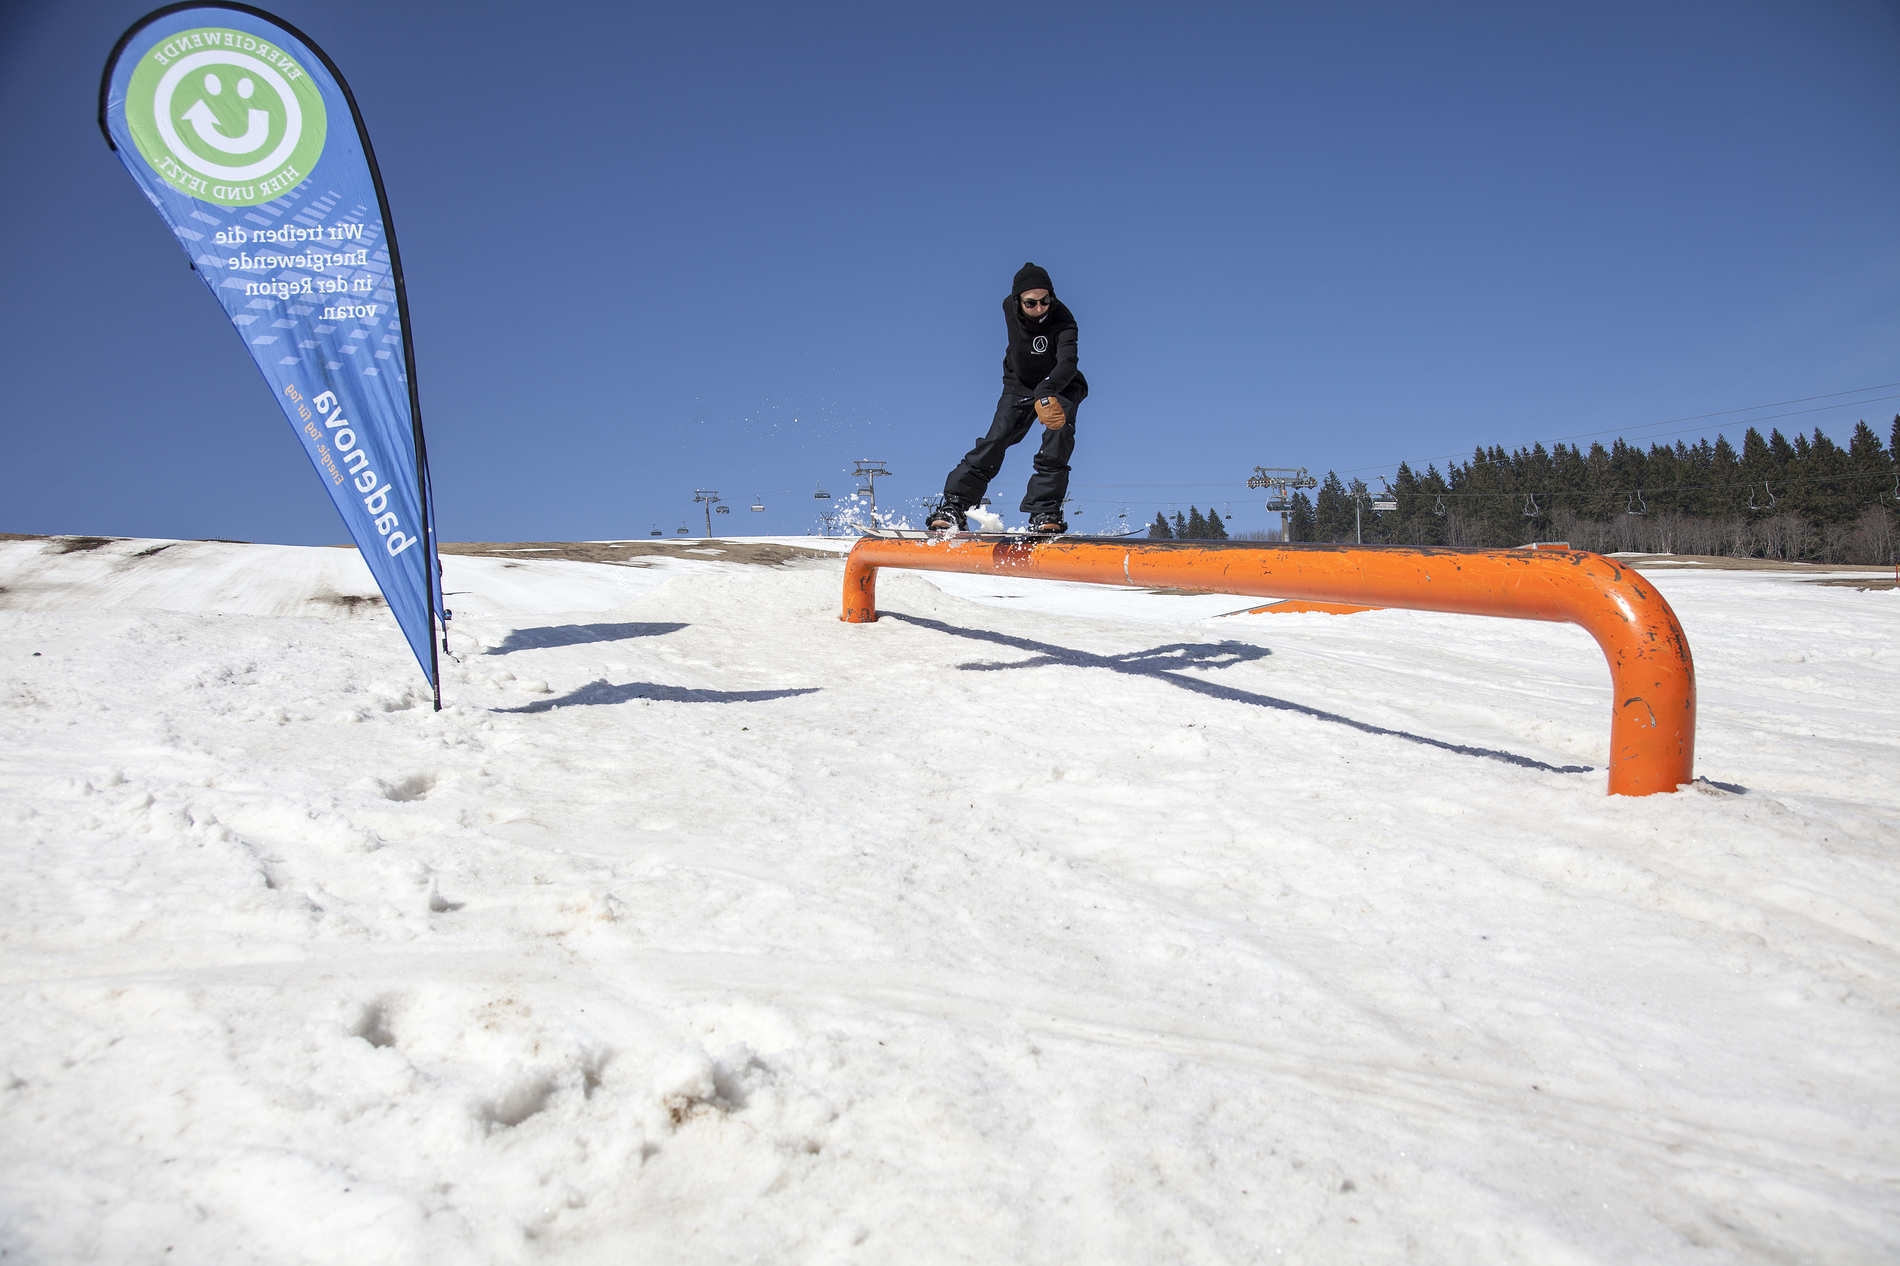 web snowpark feldberg 25 03 2017 action sb unknown martin herrmann qparks 14